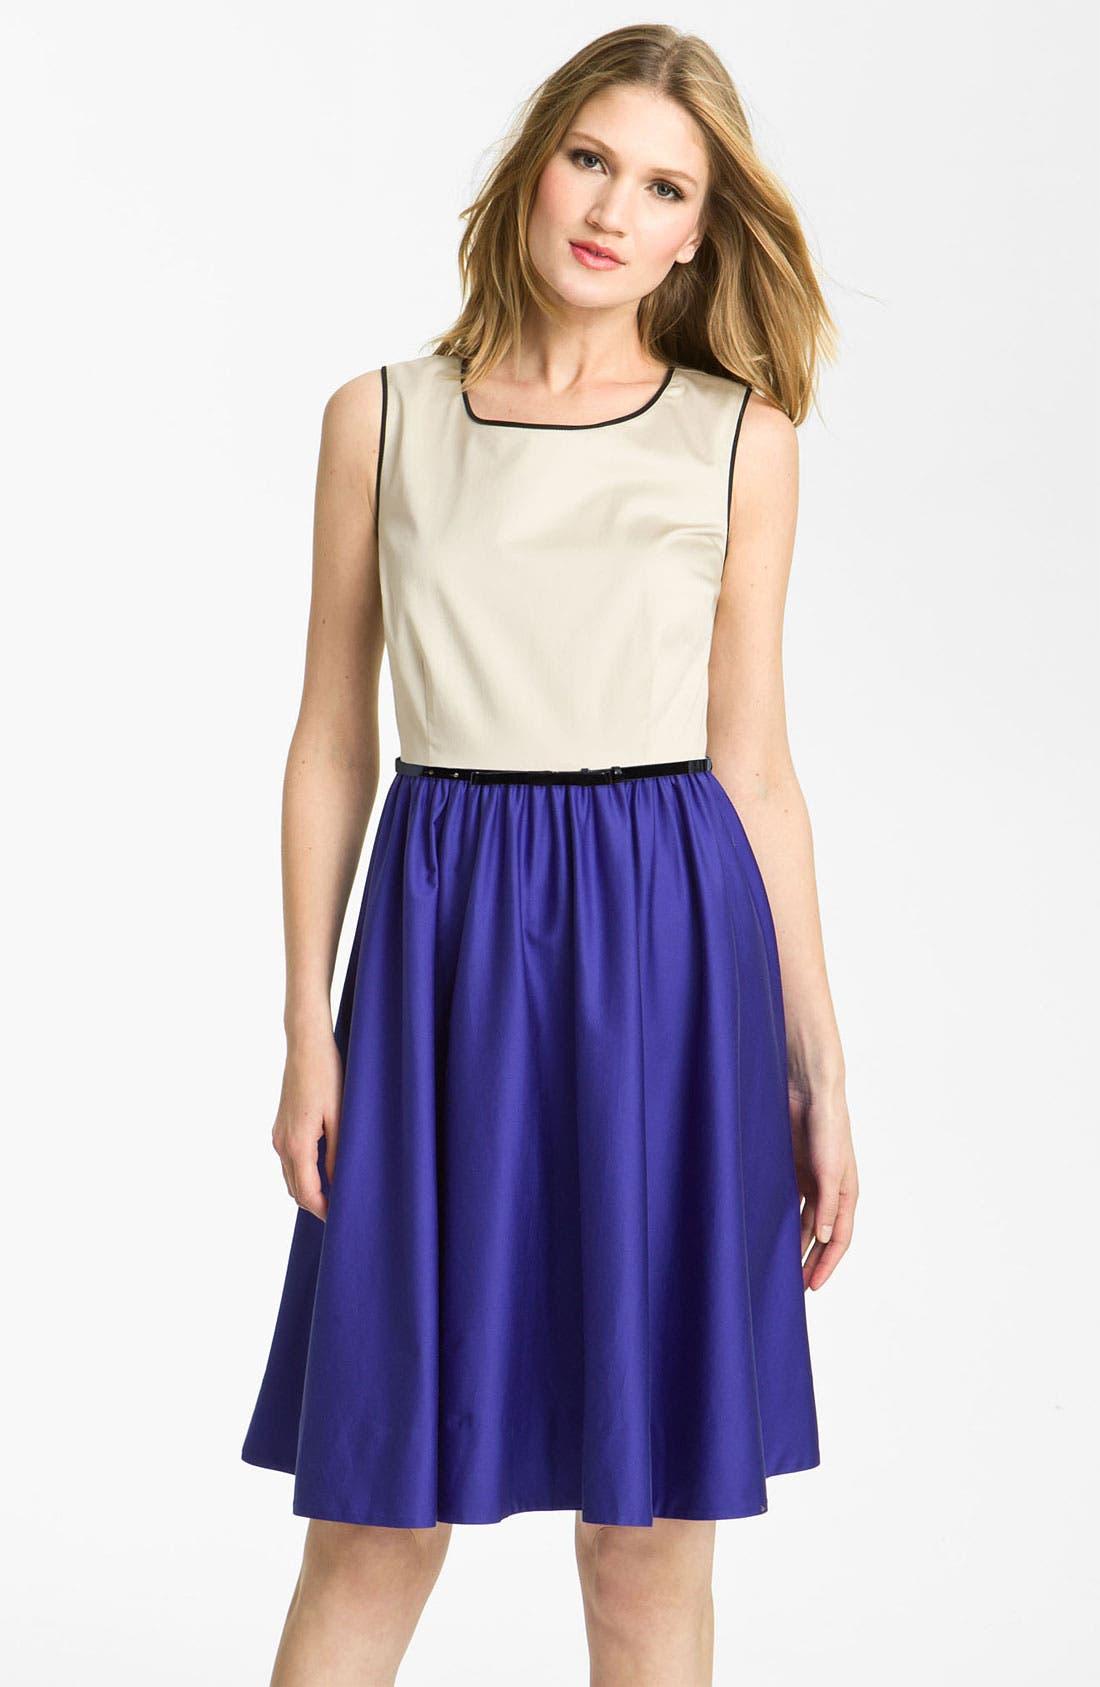 Alternate Image 1 Selected - kate spade new york 'dee' colorblock dress